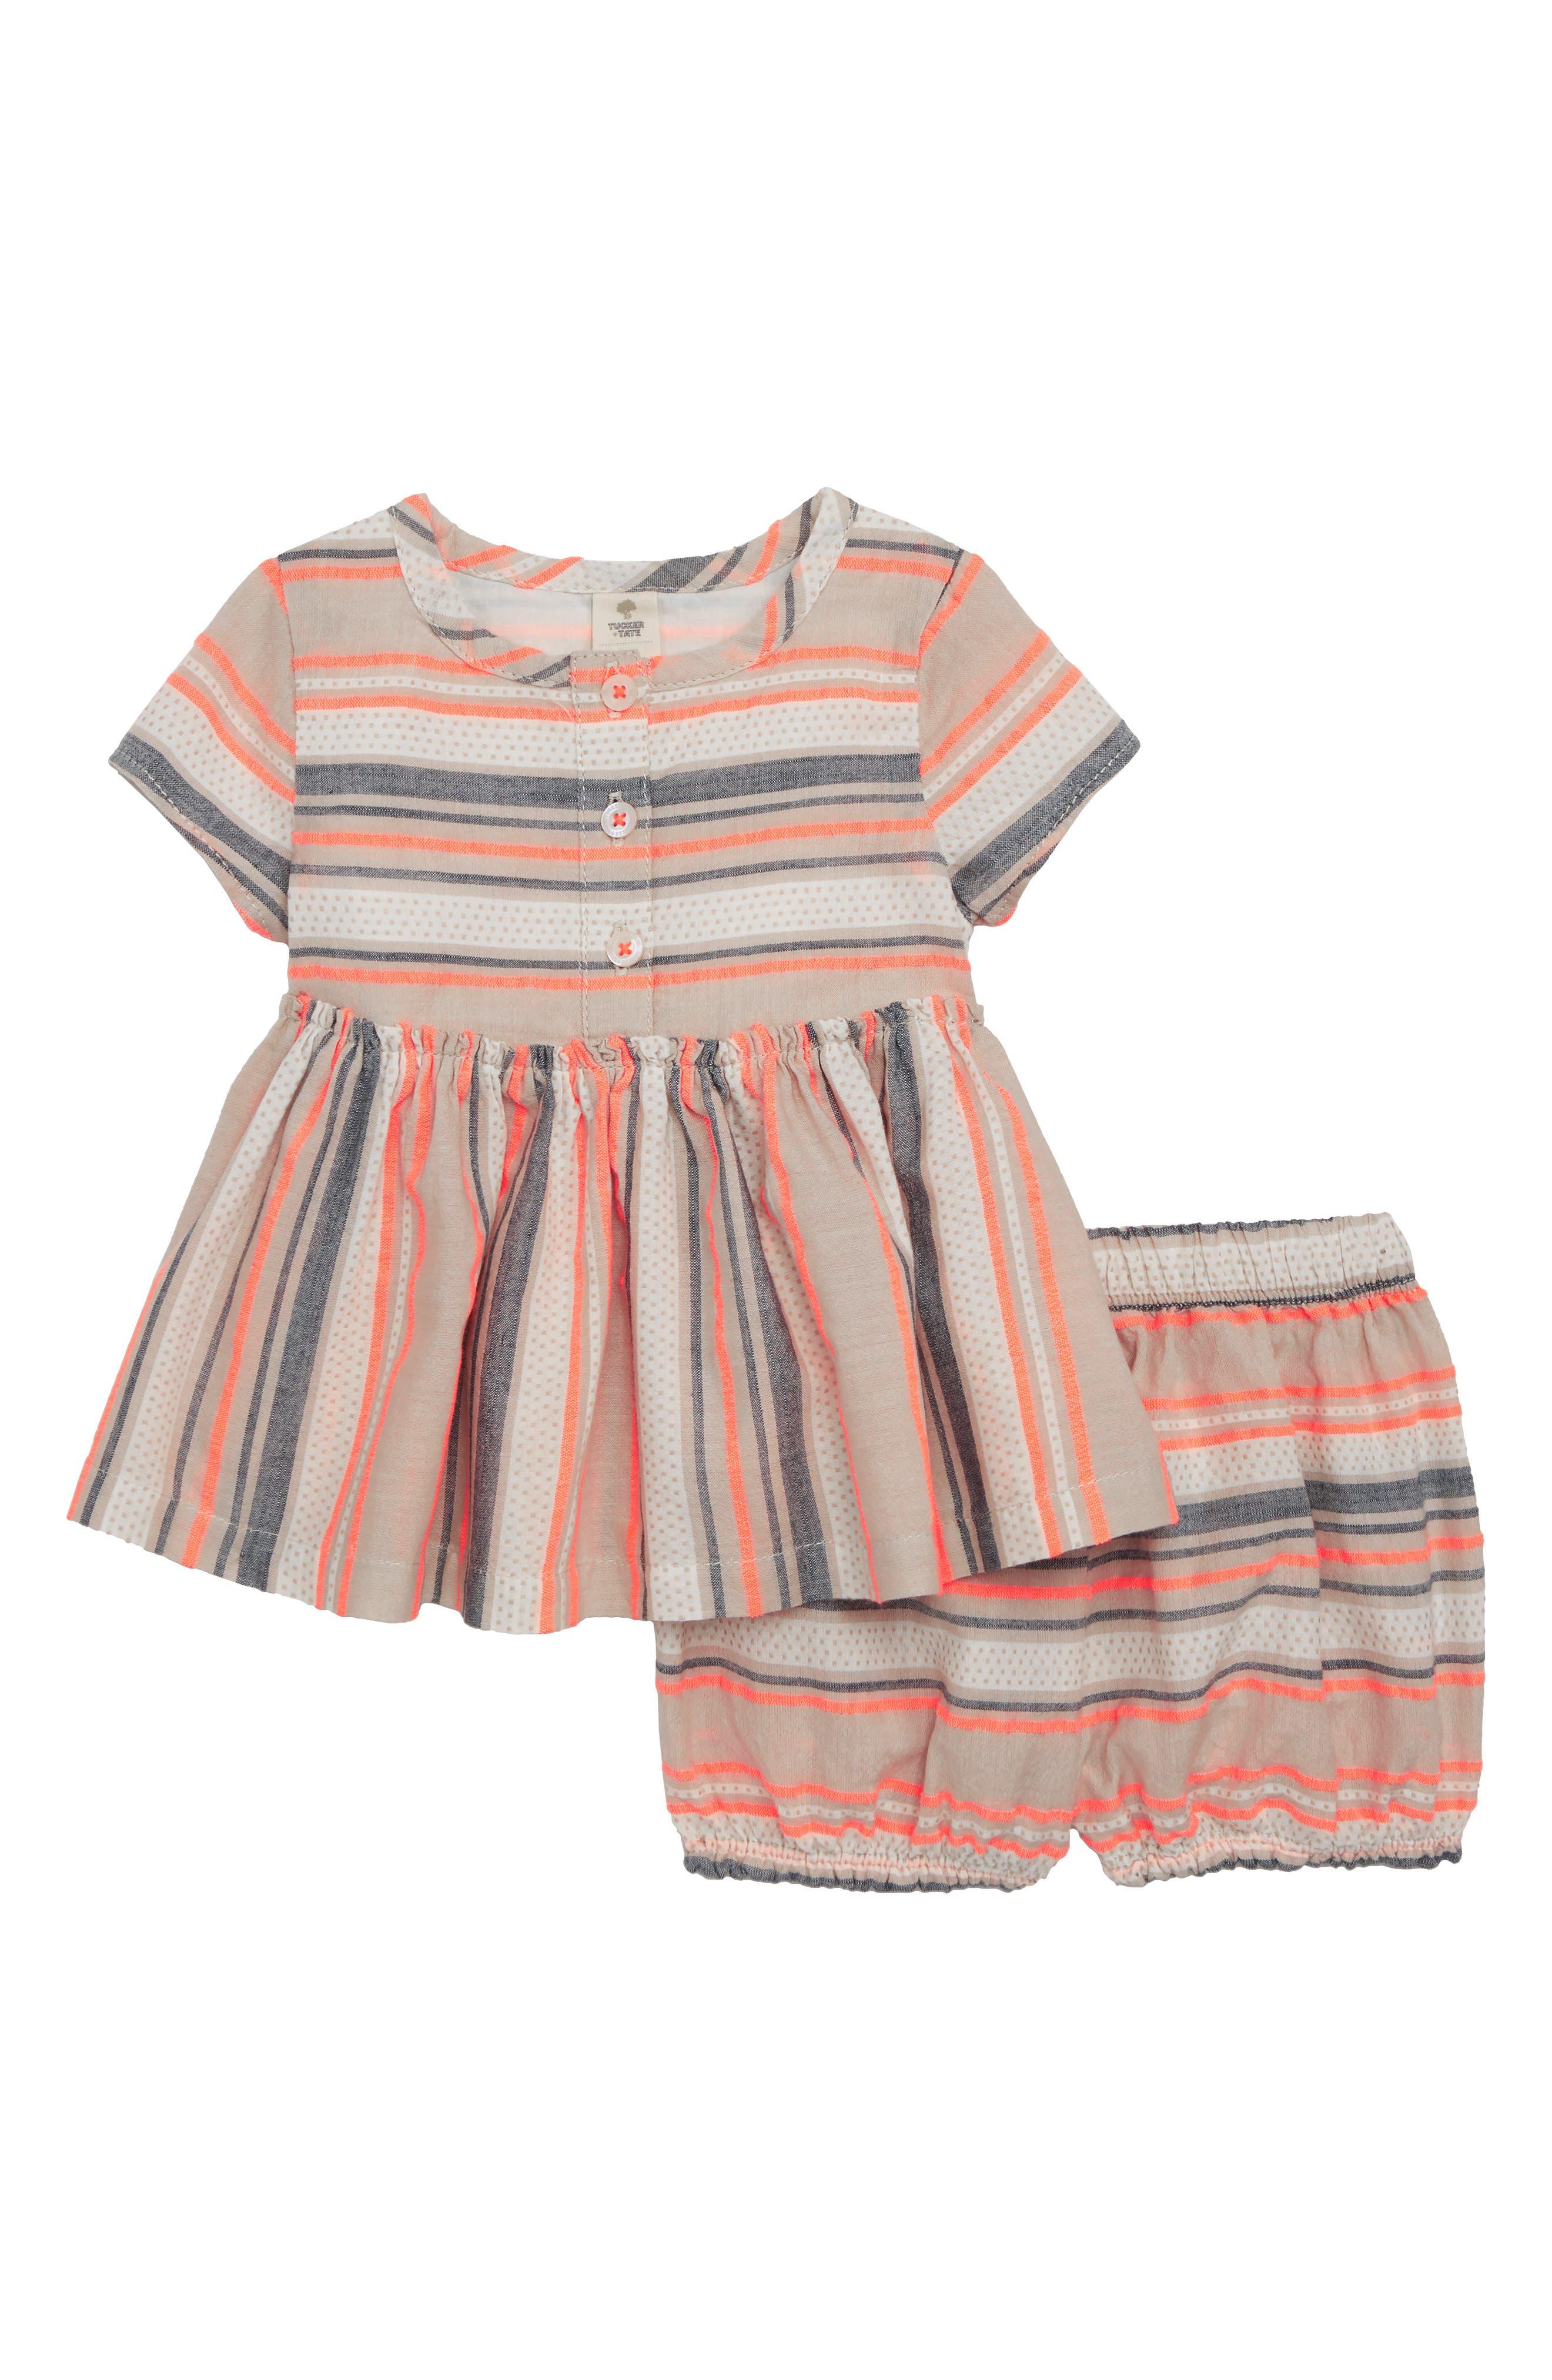 Woven Stripe Swing Top & Bubble Shorts Set,                         Main,                         color, Pink Cloud Multi Stripe